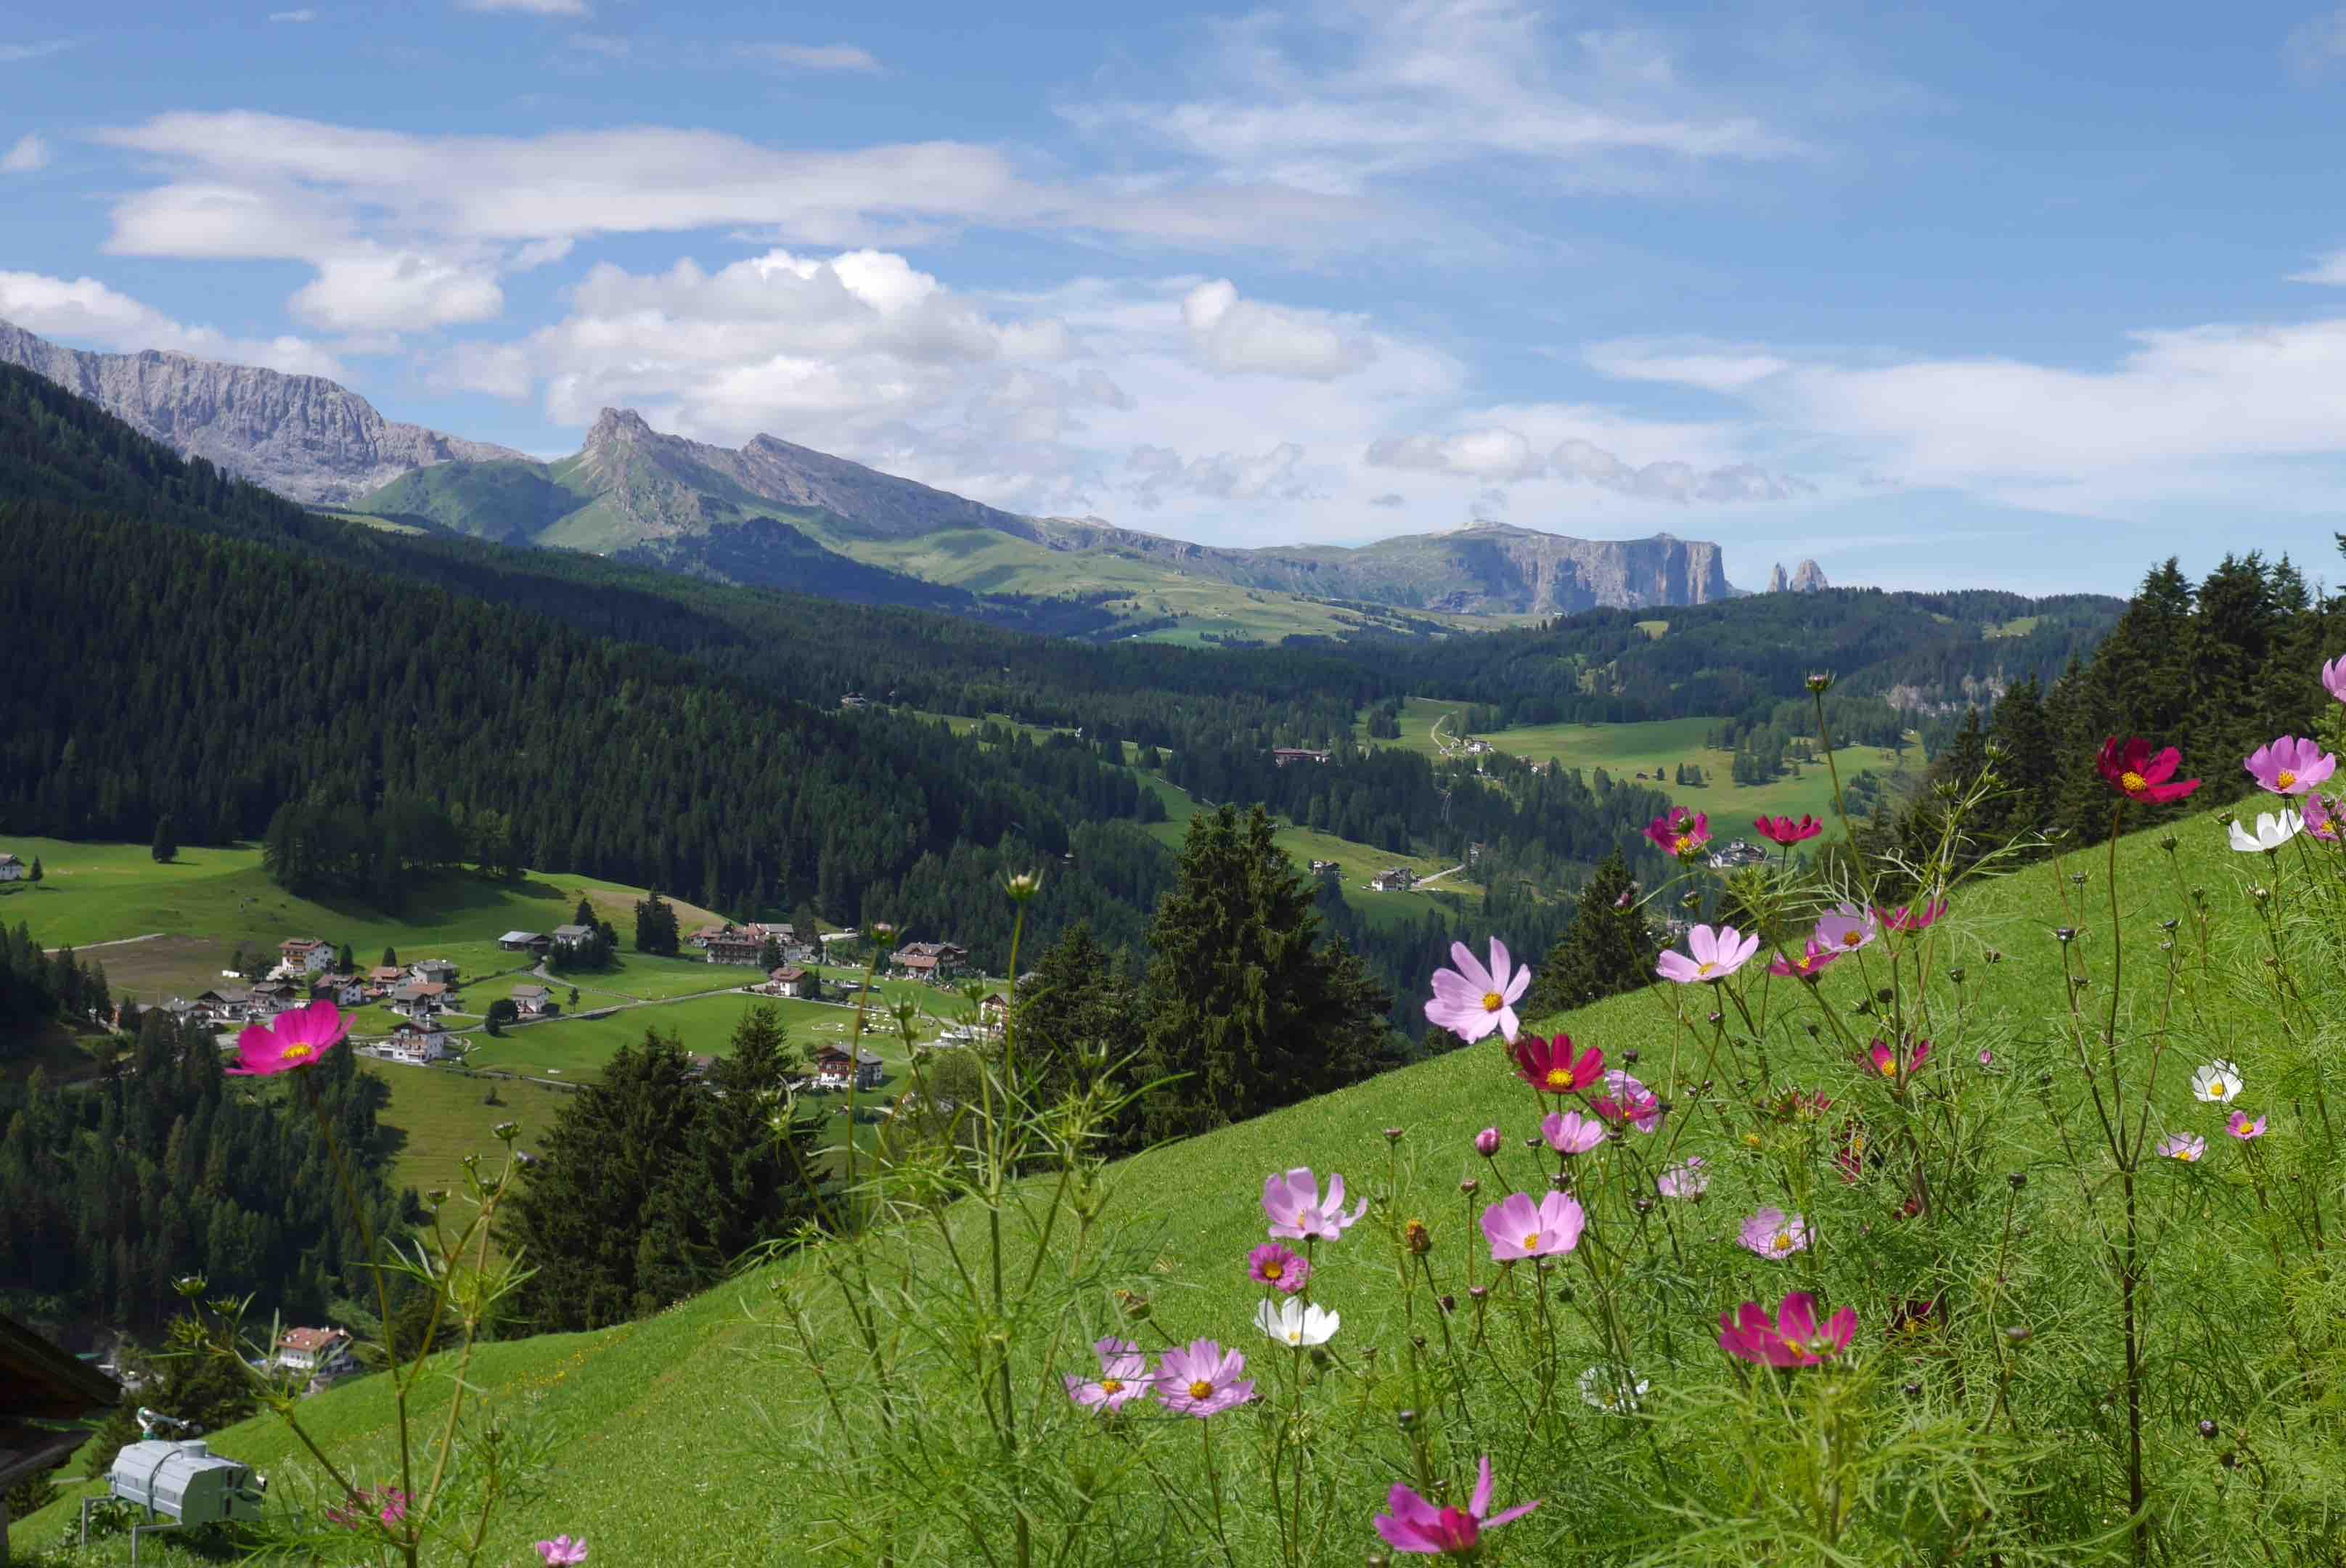 montagne-italie-ali-di-firenze-20